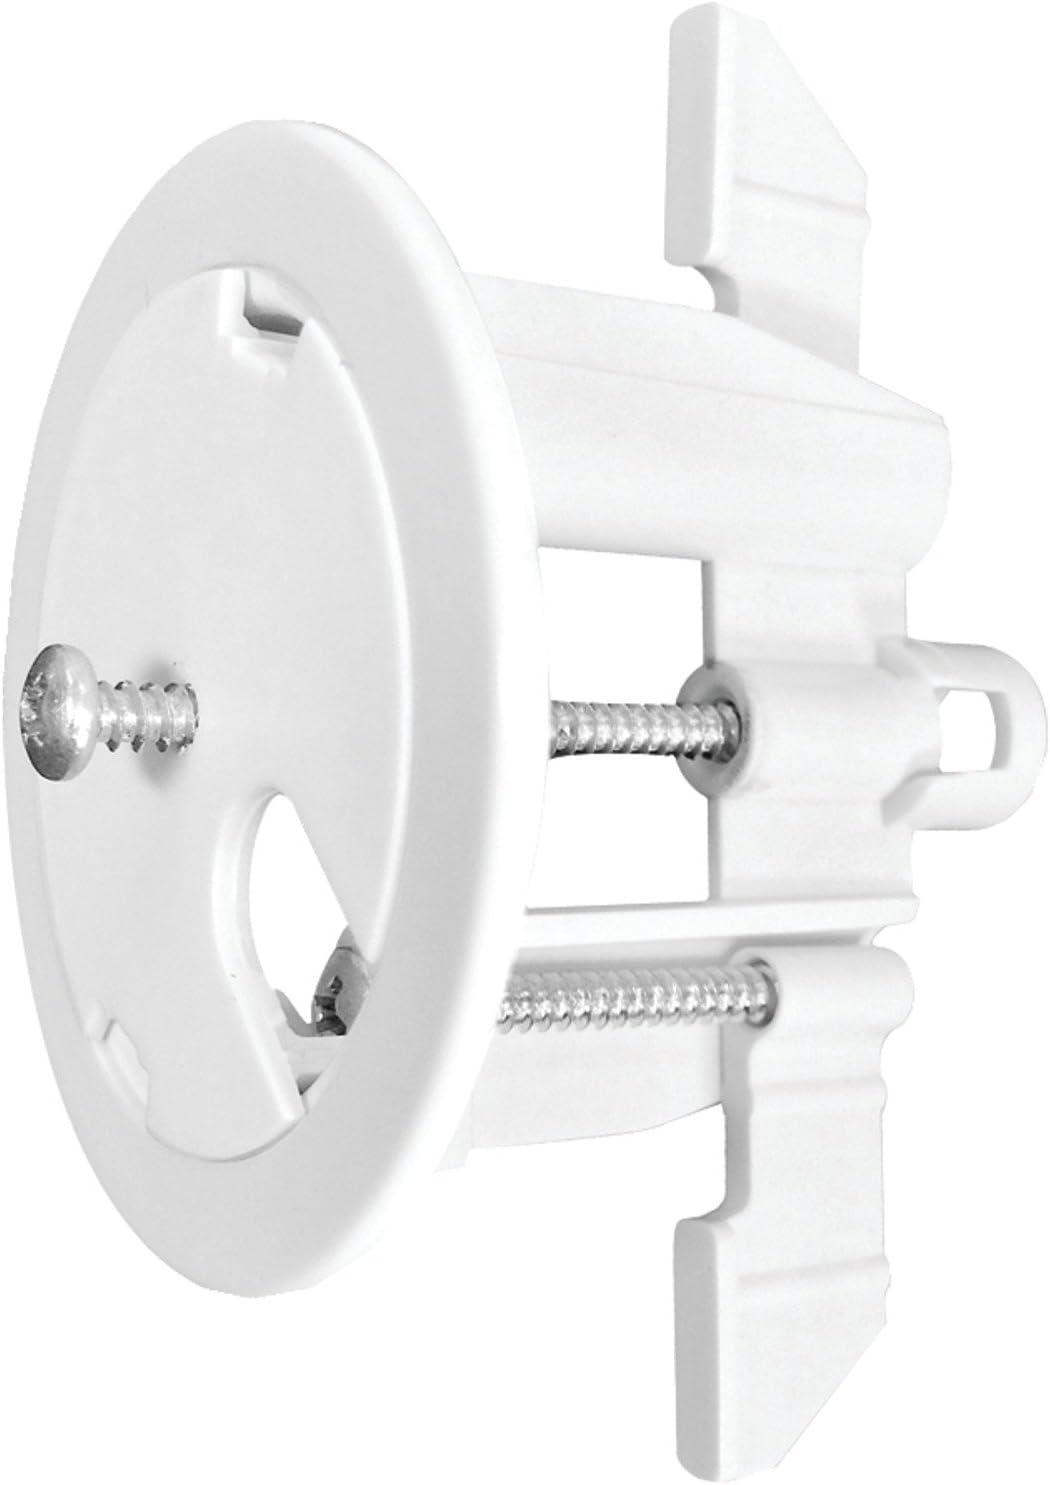 White MIDLITE R1SPSC-W SpeedPort Sc 2 Universal Cable Pass Through Fastening /& Anchor System